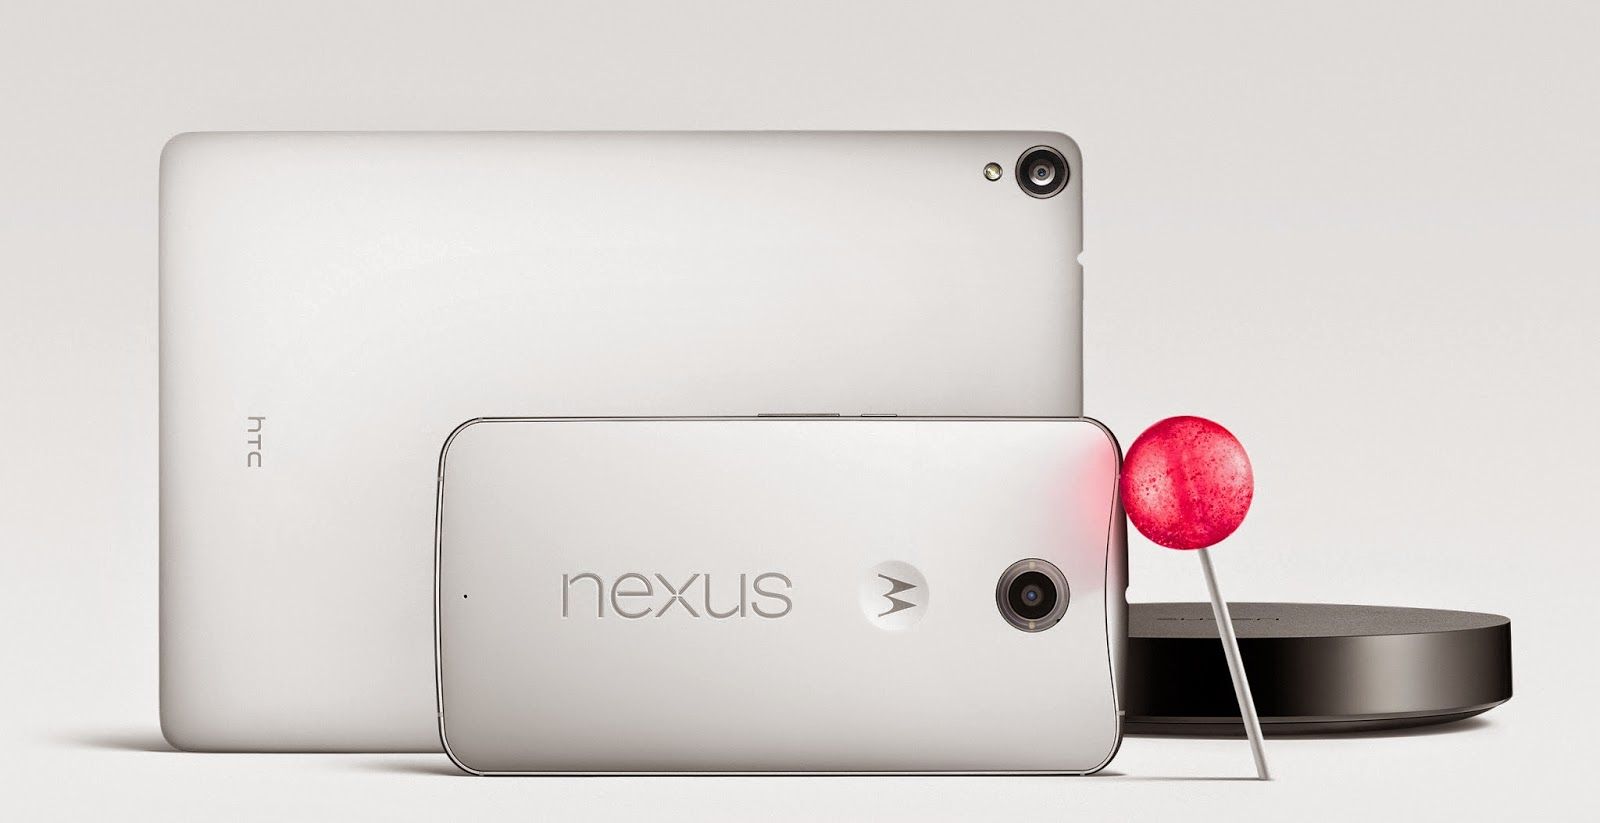 Nexus 6, Nexus 9, and Nexus Player Family with Lollipop